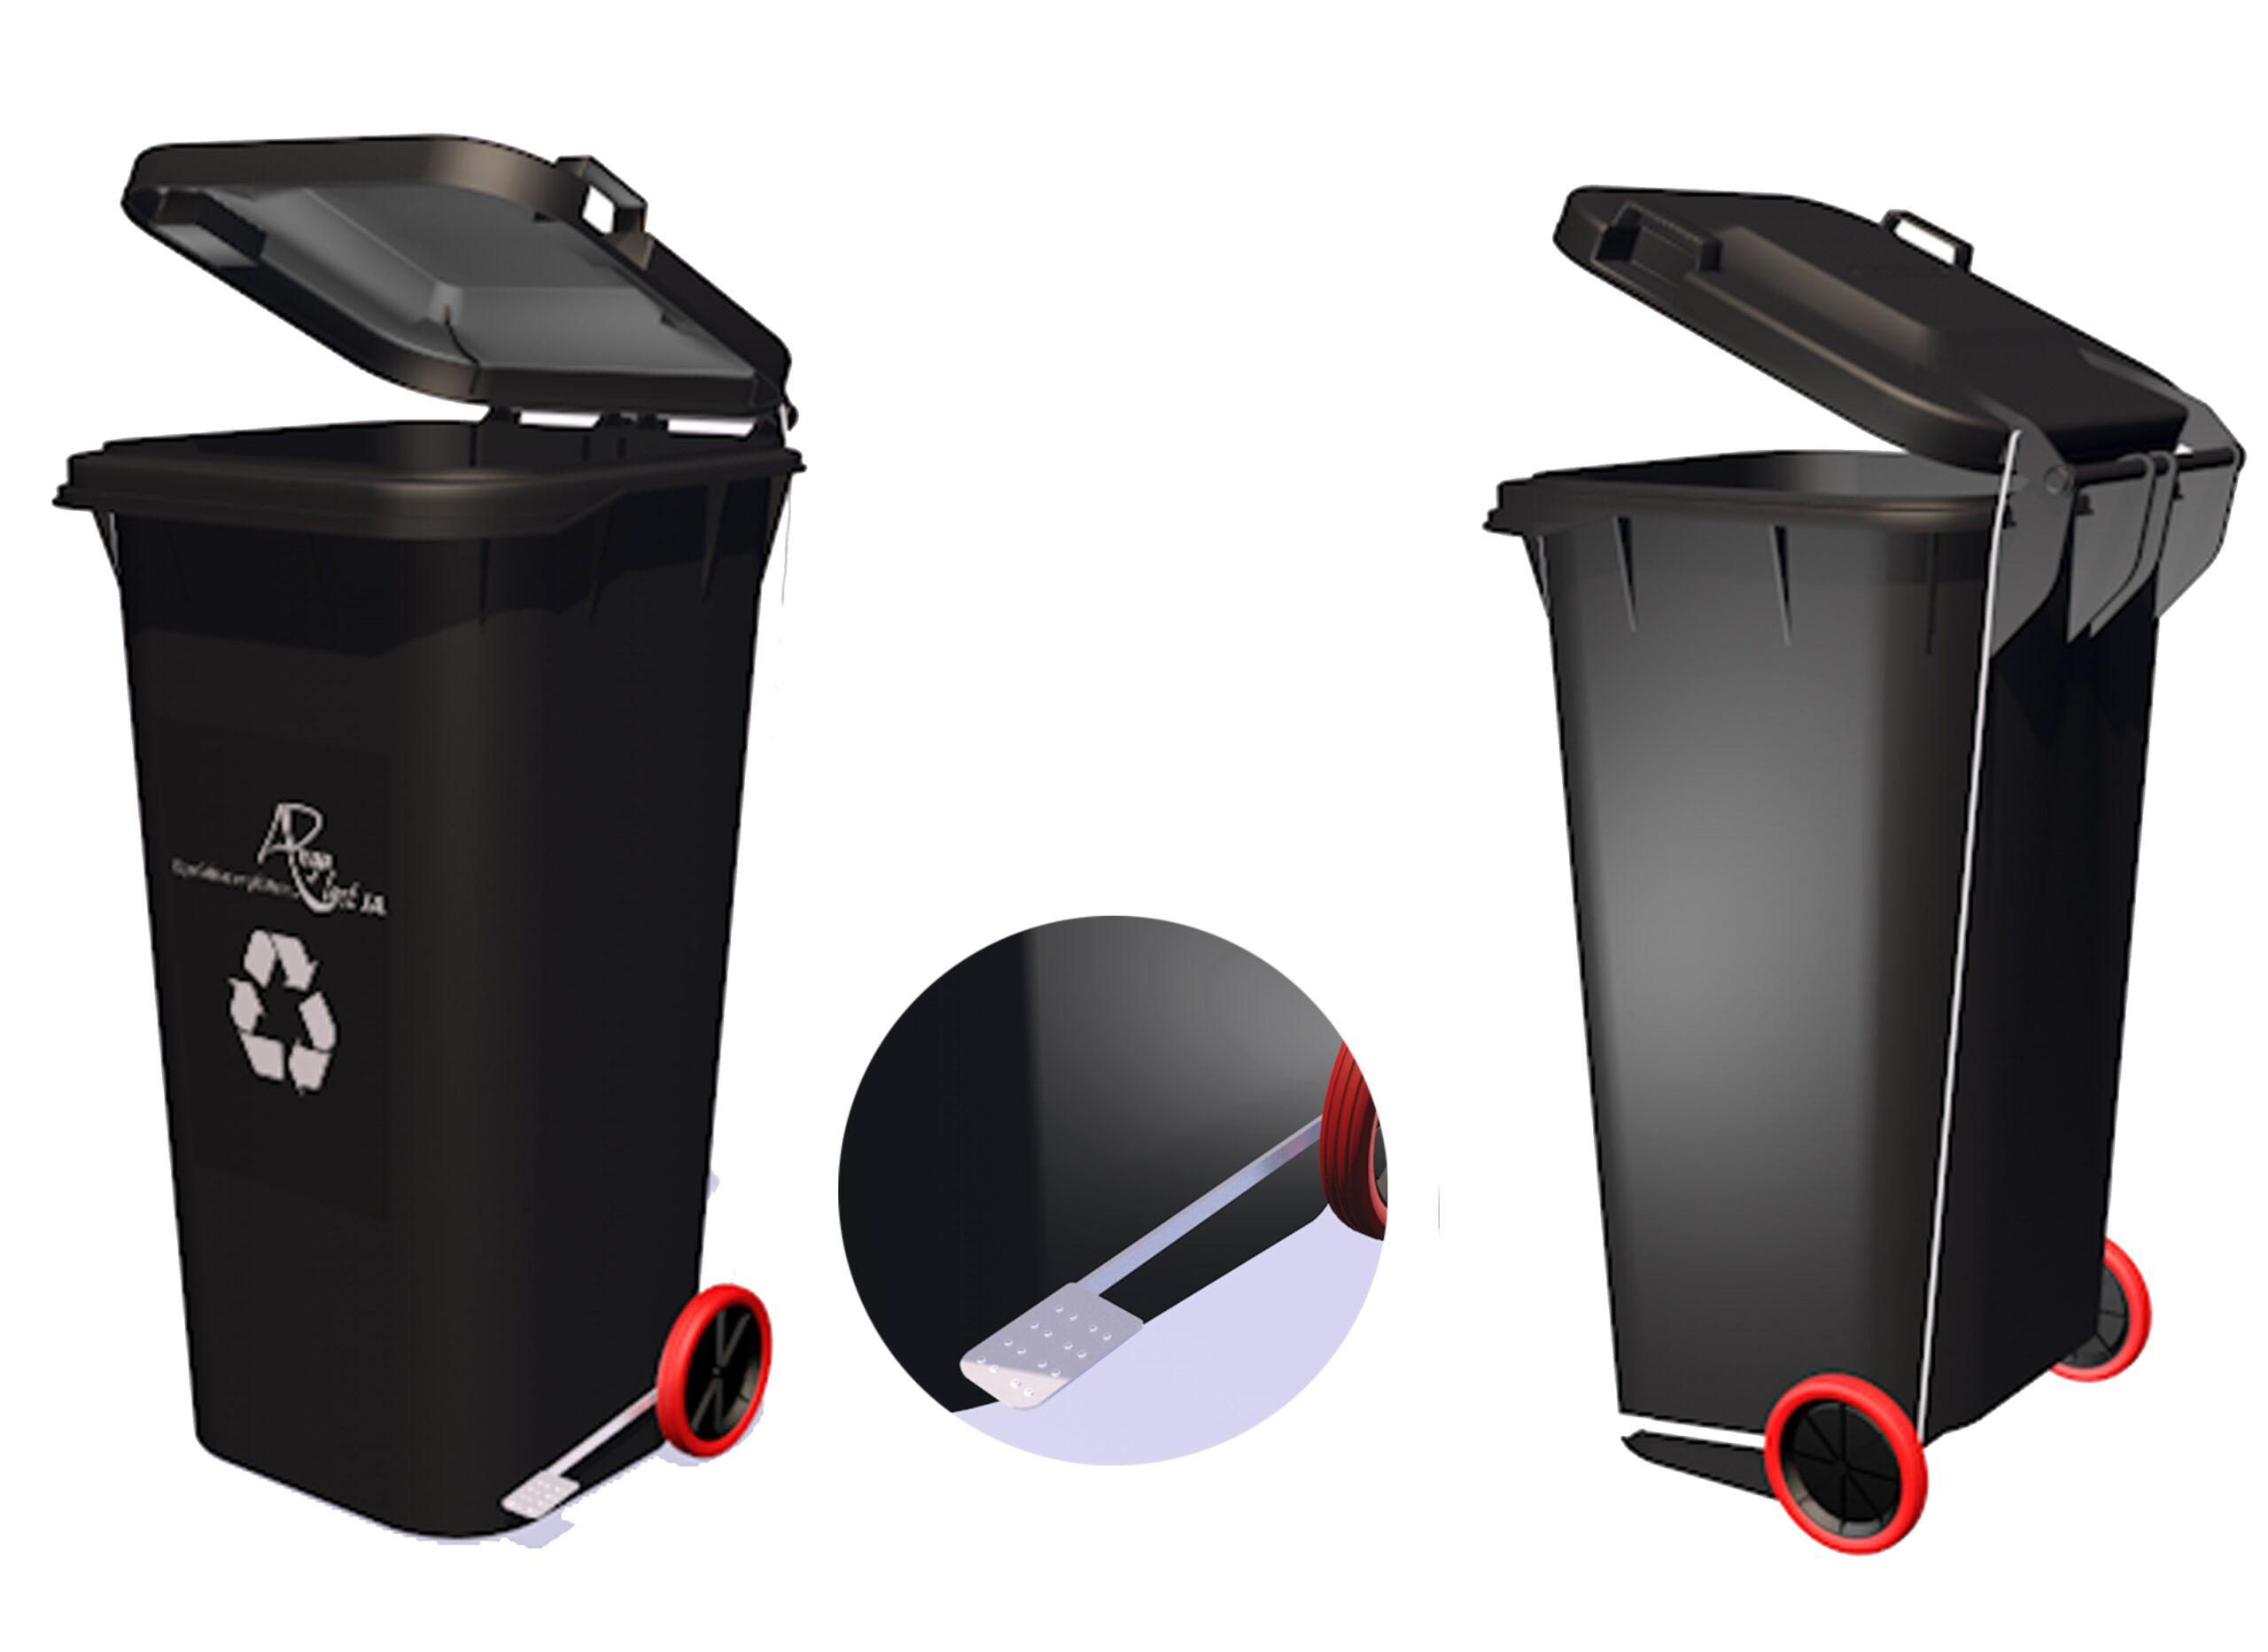 Tacho reciclador de 120 litros